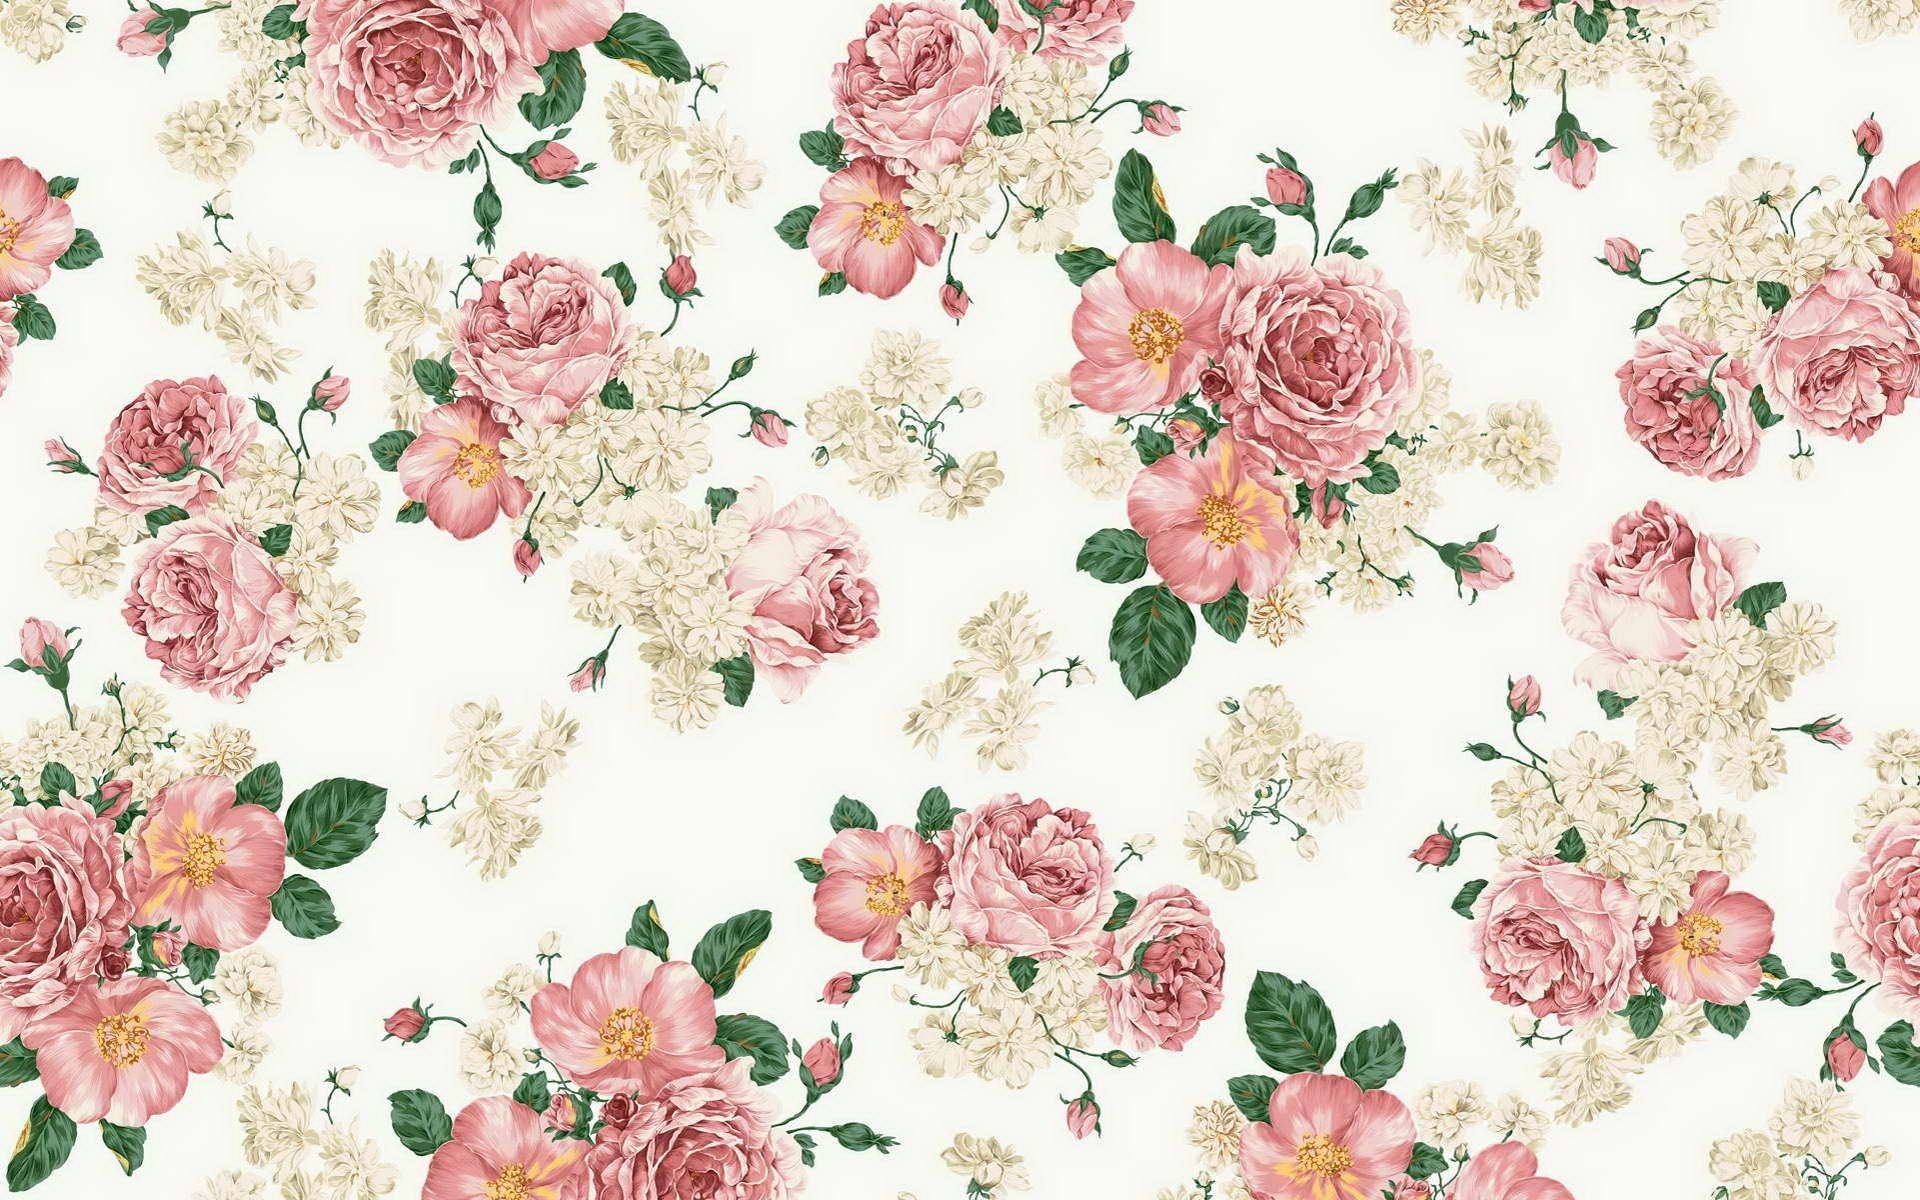 Image Result For Aesthetic Laptop Wallpaper Vintage Flowers Wallpaper Vintage Floral Backgrounds Floral Pattern Wallpaper